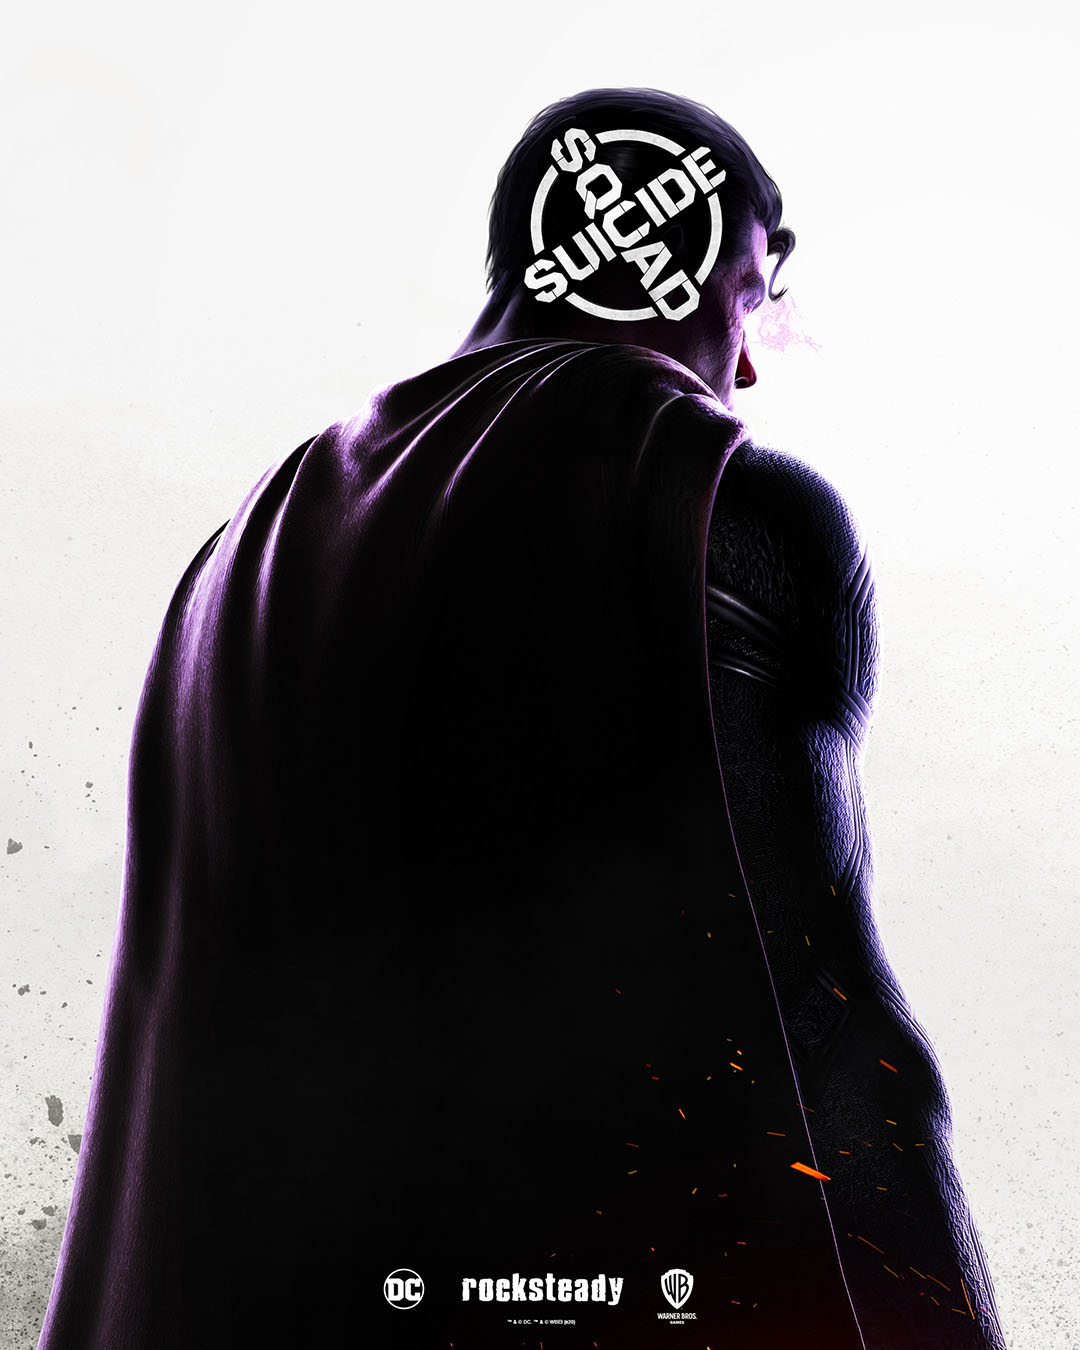 Авторы Batman: Arkham анонсируют игру про схватку Отряда самоубийц иЛиги справедливости